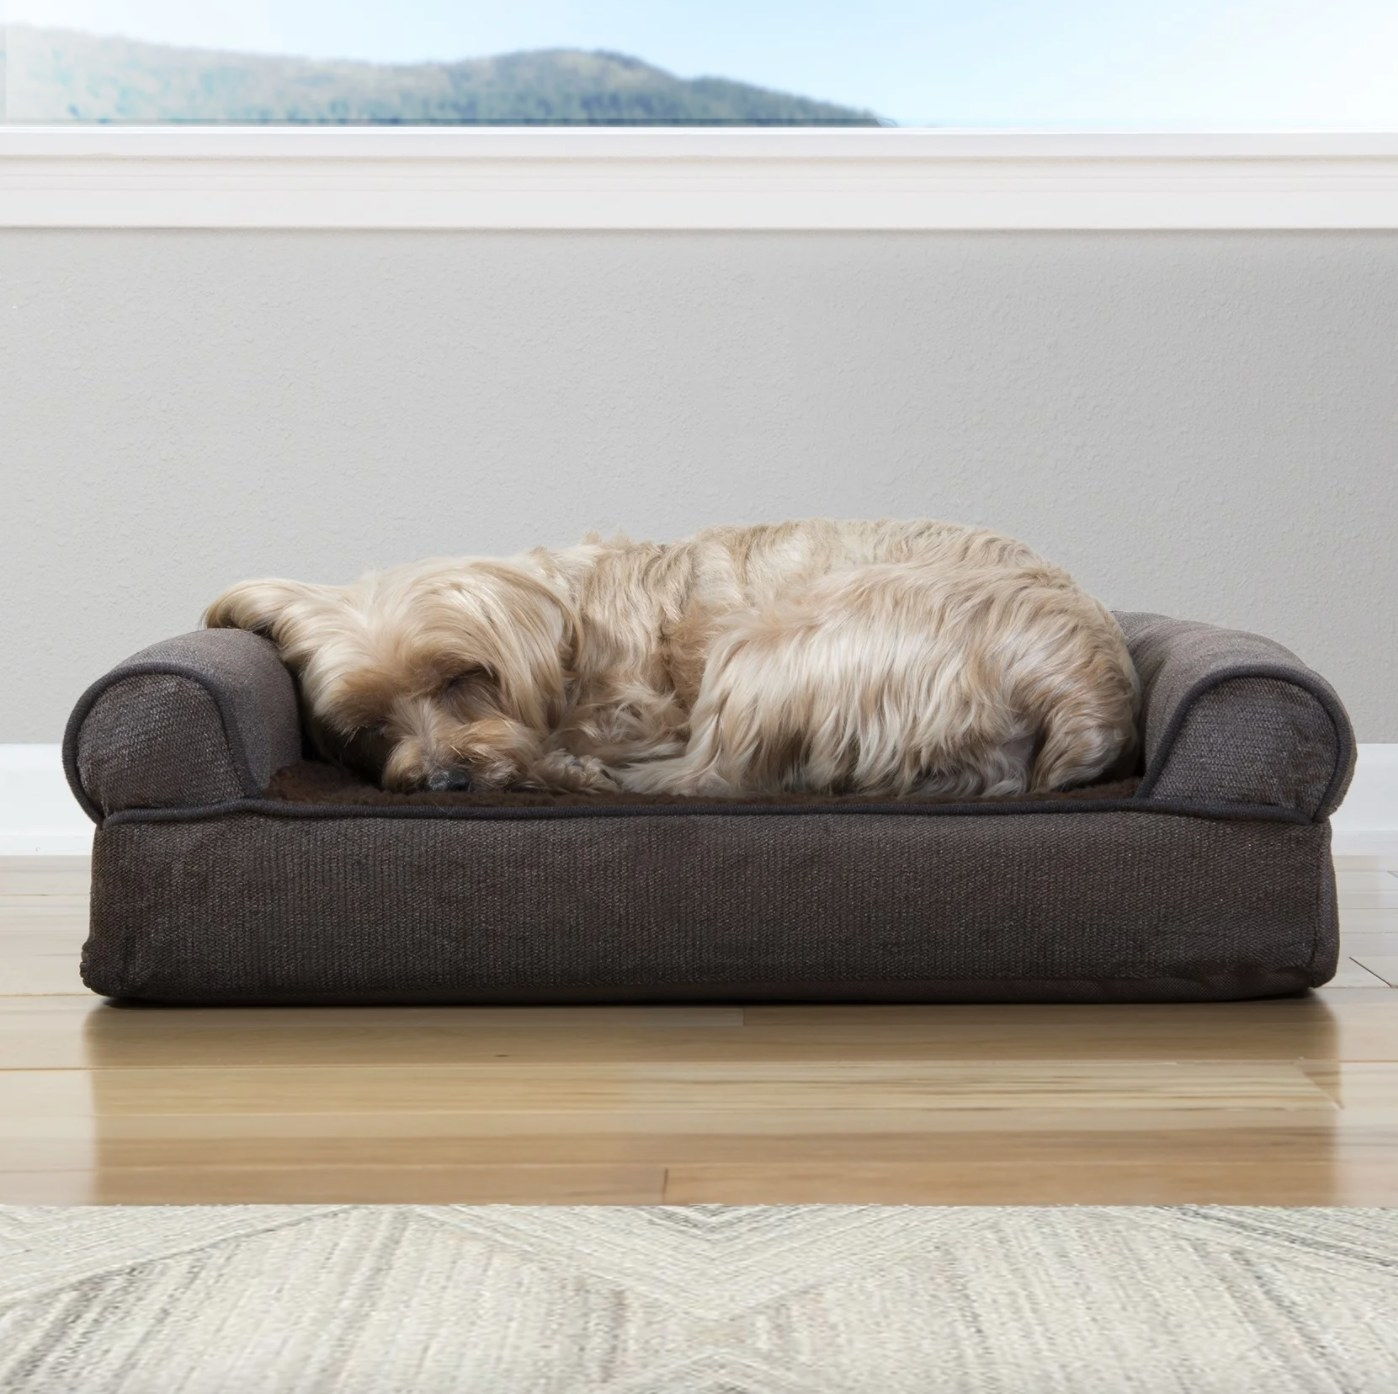 Dog sleeping on the dog bed that has corduroy-like fabric